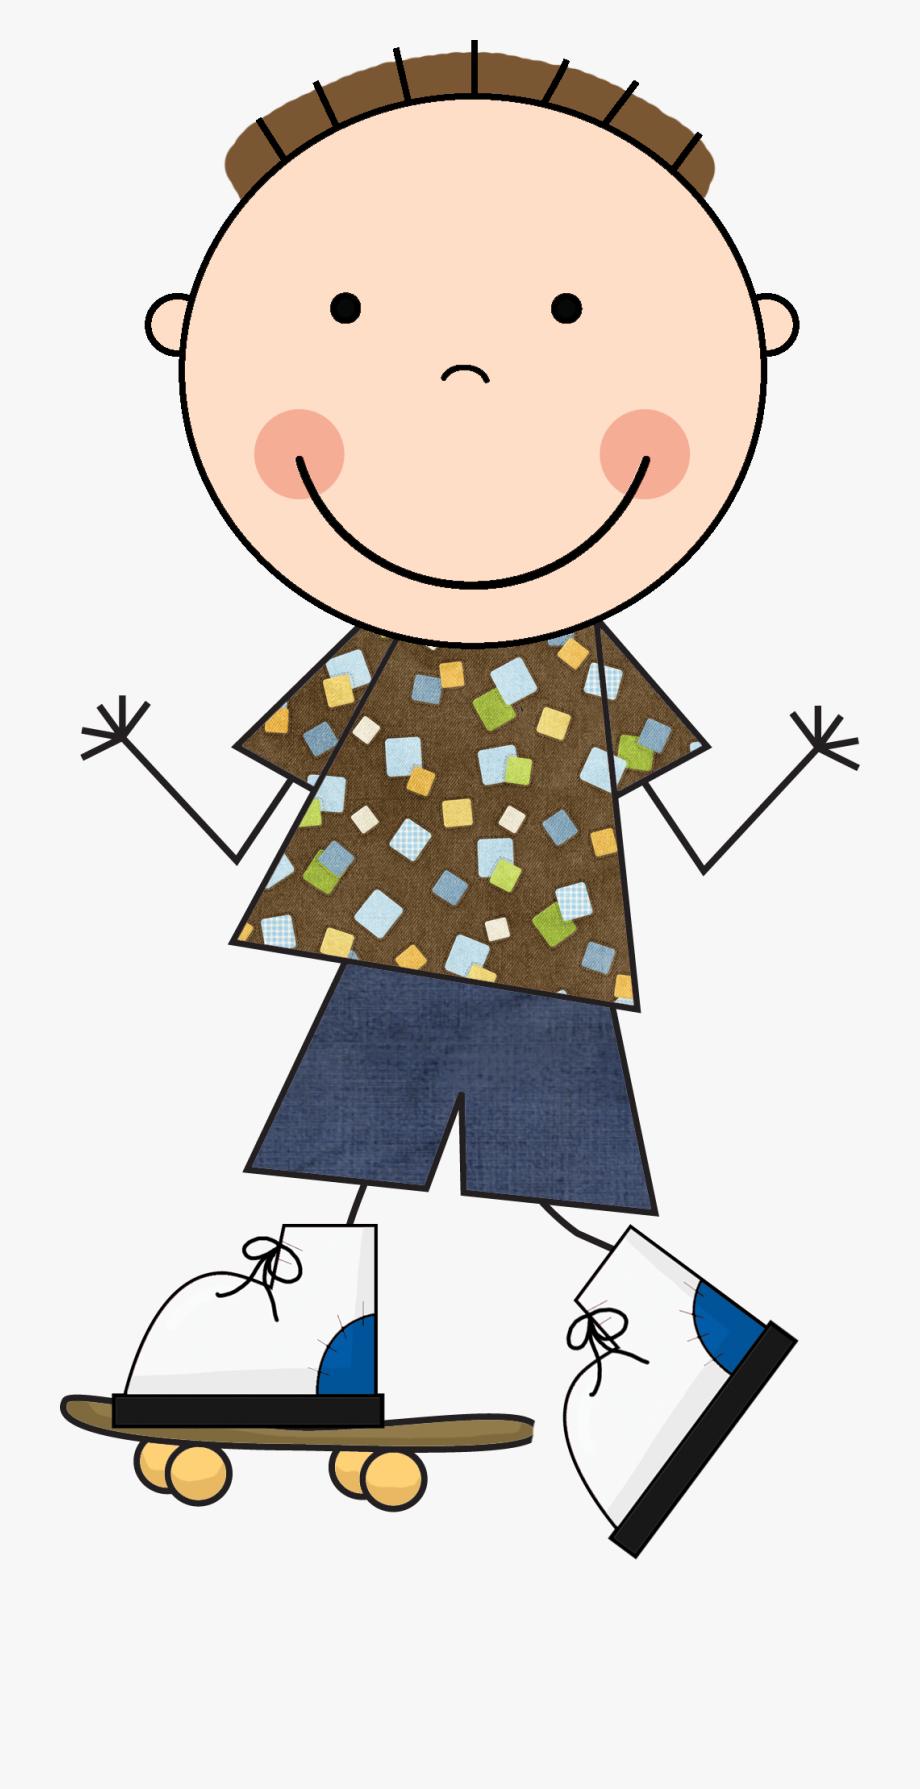 graphic transparent stock Golden clipart stick figure. Scrappin doodle boy